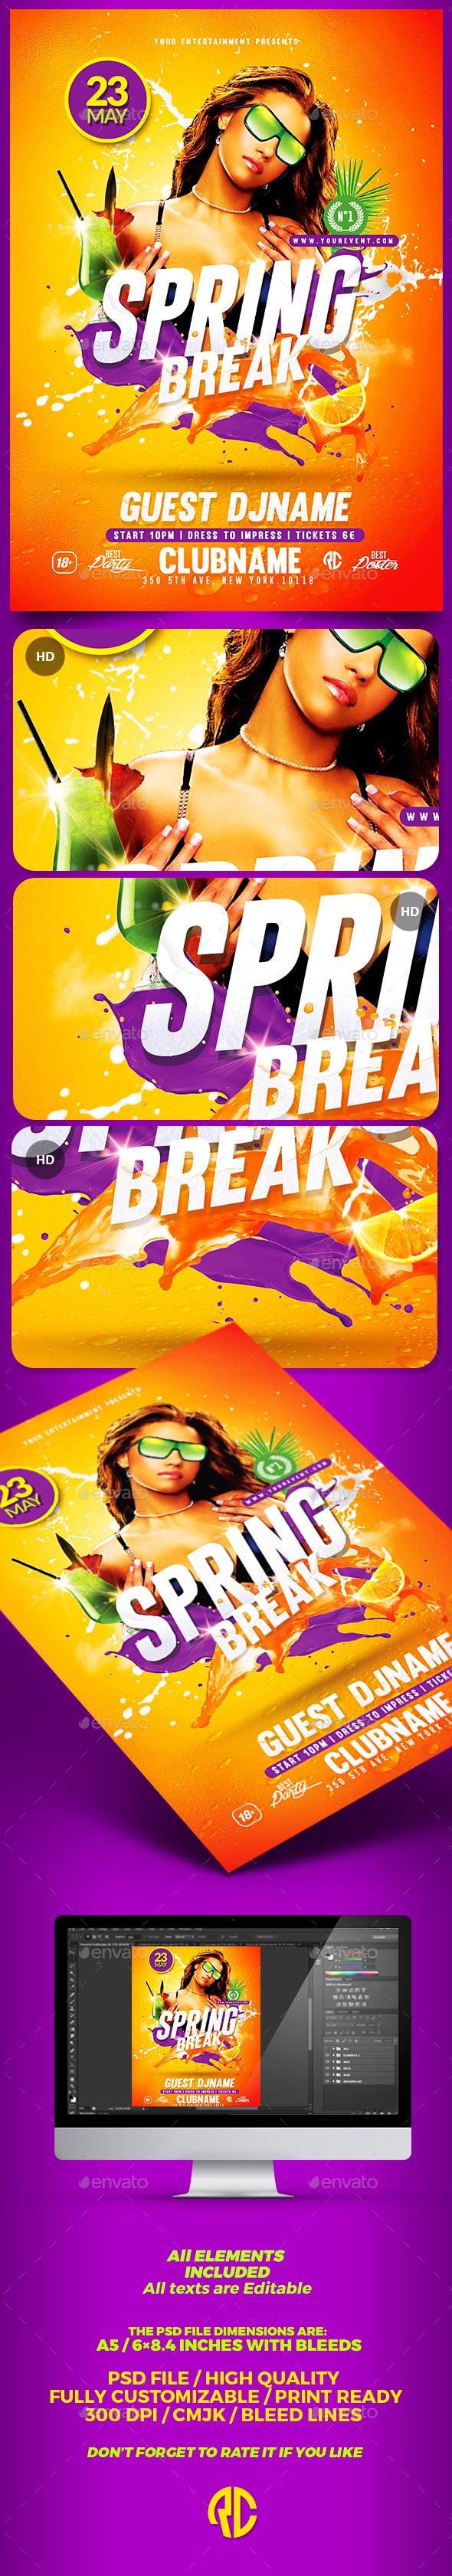 Spring Break Flyer | Psd Template  - Print Templates